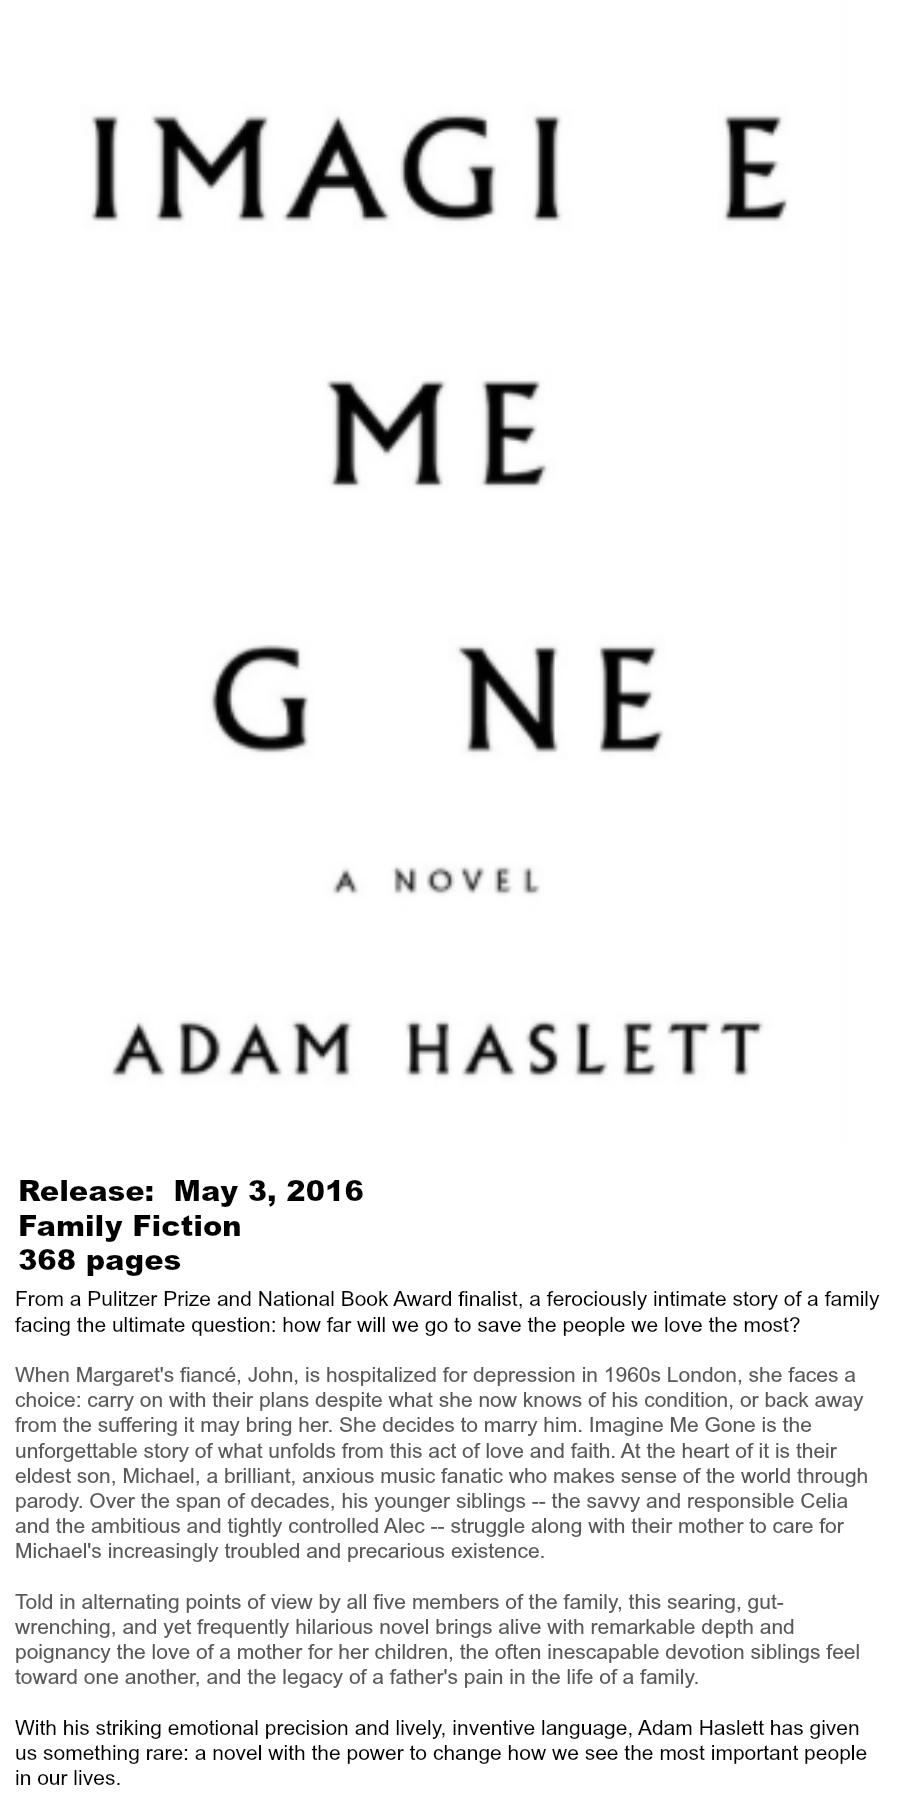 Must-read Books of Summer 2016 - Imagine Me Gone Adam Haslett